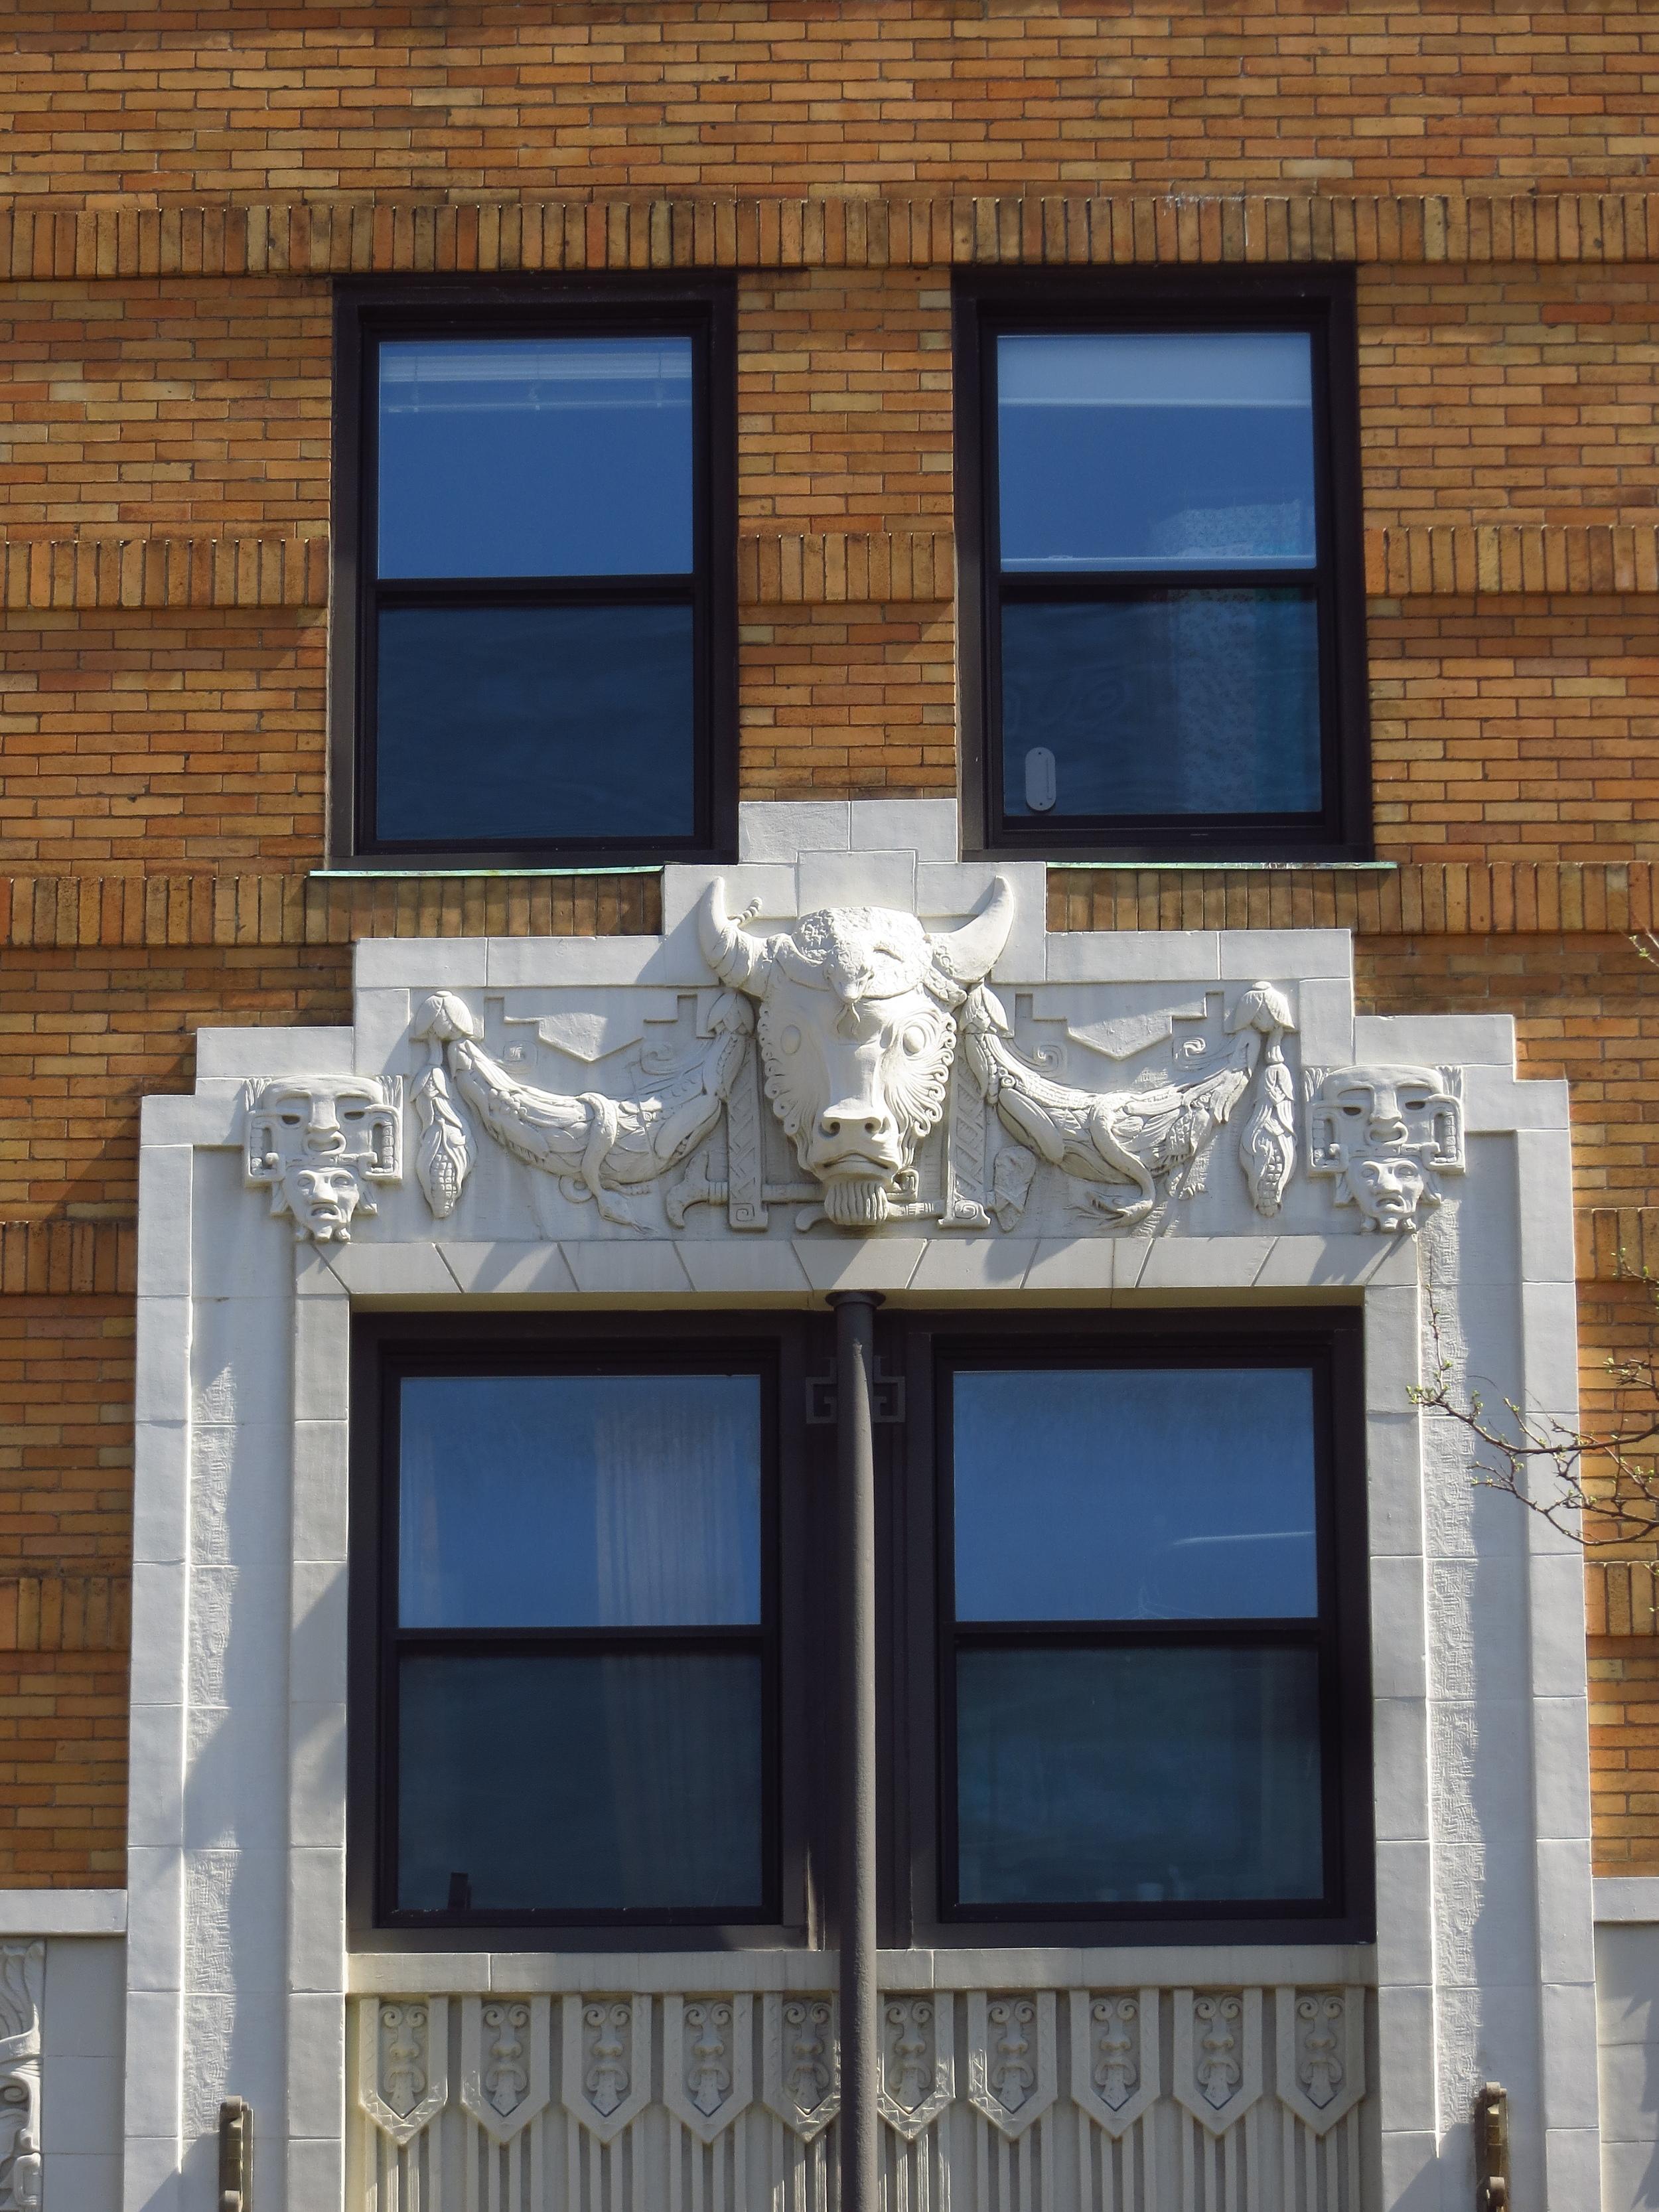 This building had a Buffalo head,